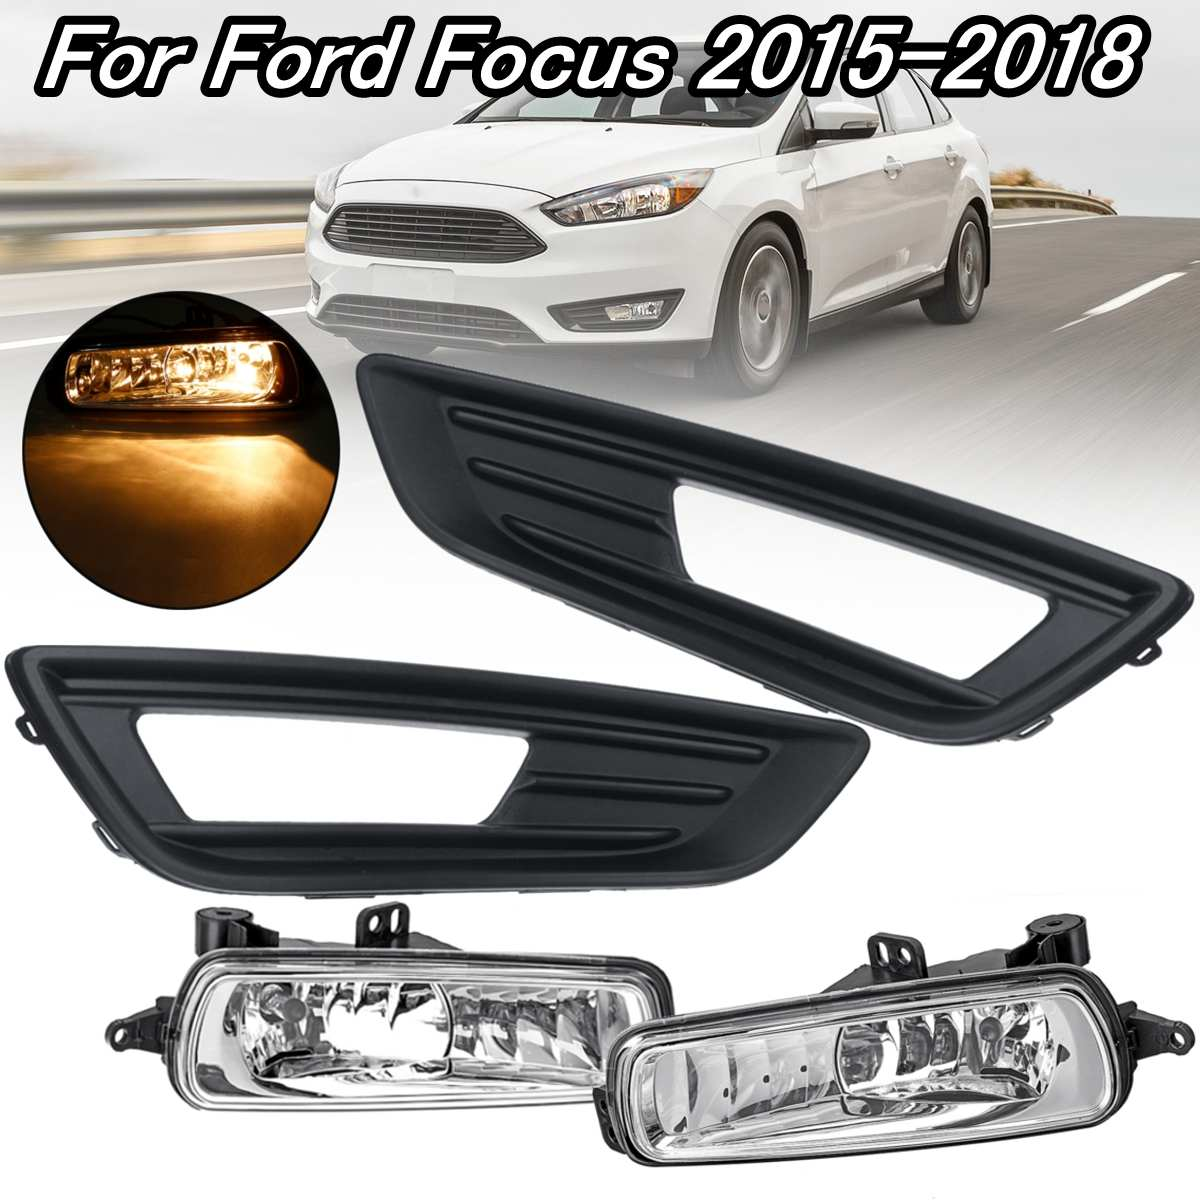 Front Bumper Fog Light Lamp Cover Left Driver Side Fit For Ford Focus 2015-2018